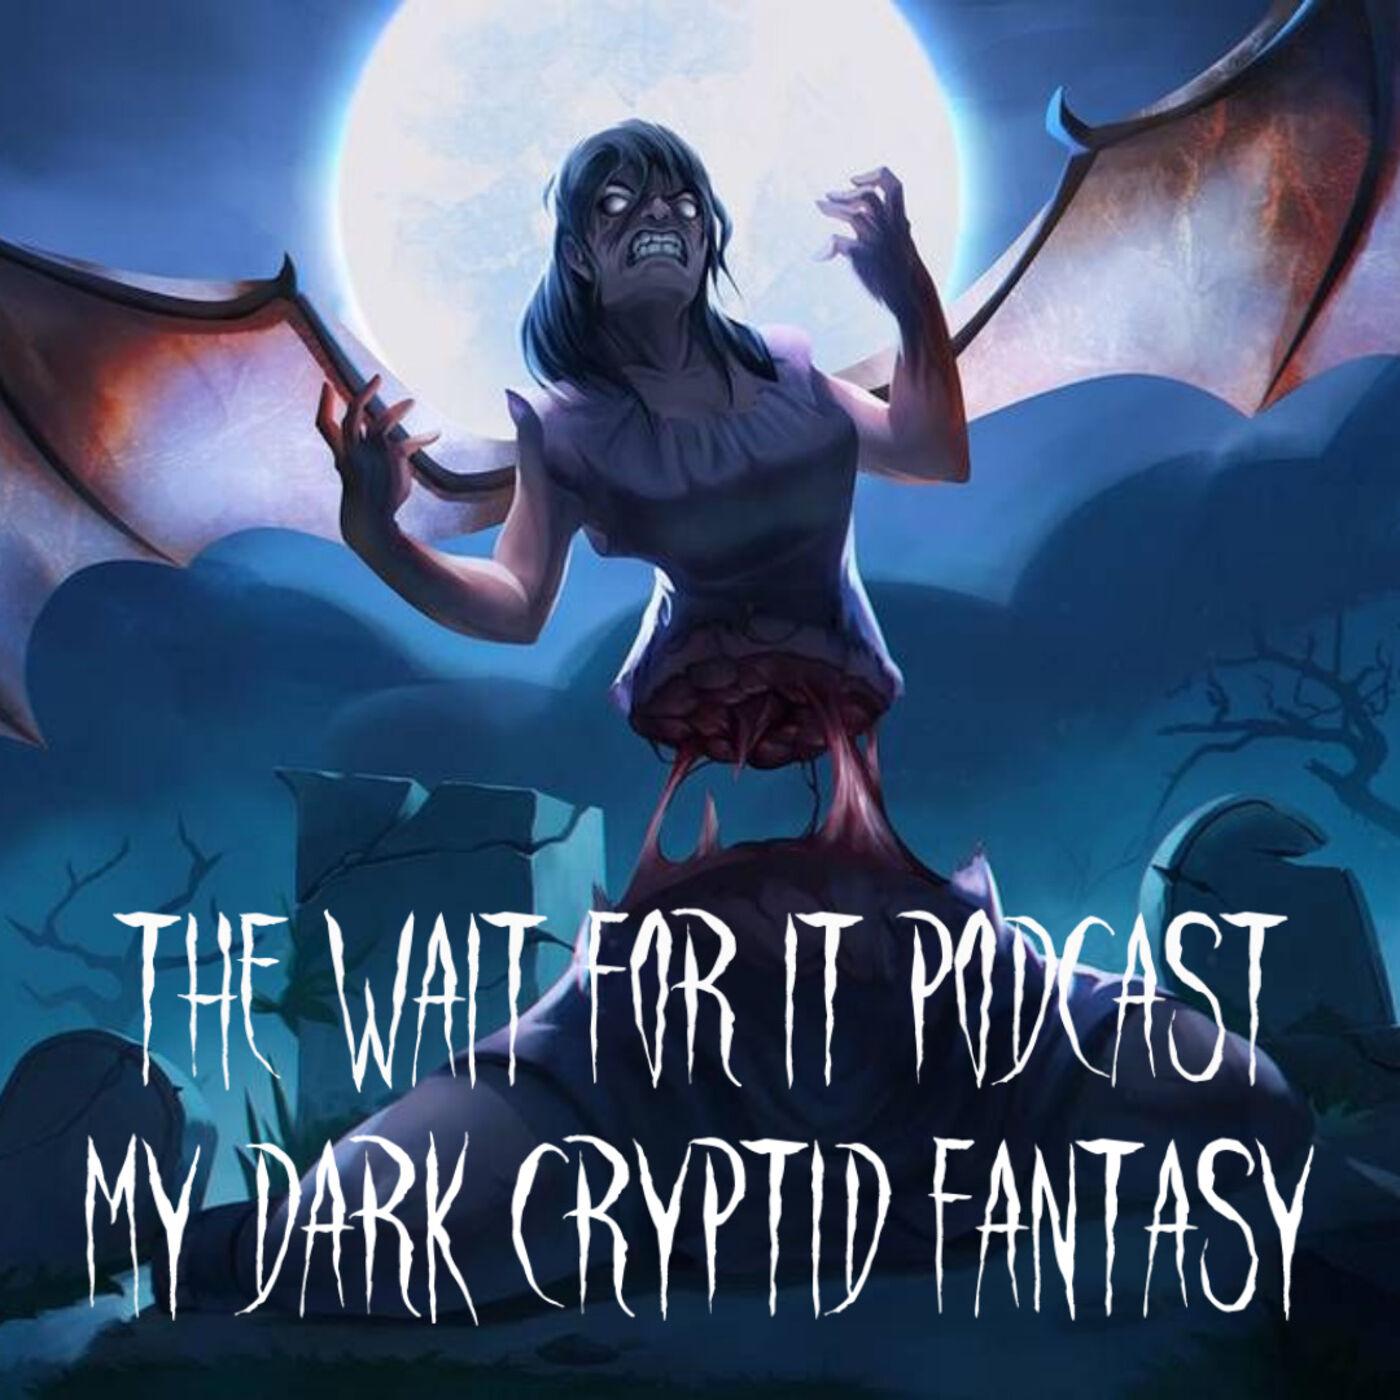 My Dark Cryptid Fantasy - Aswang